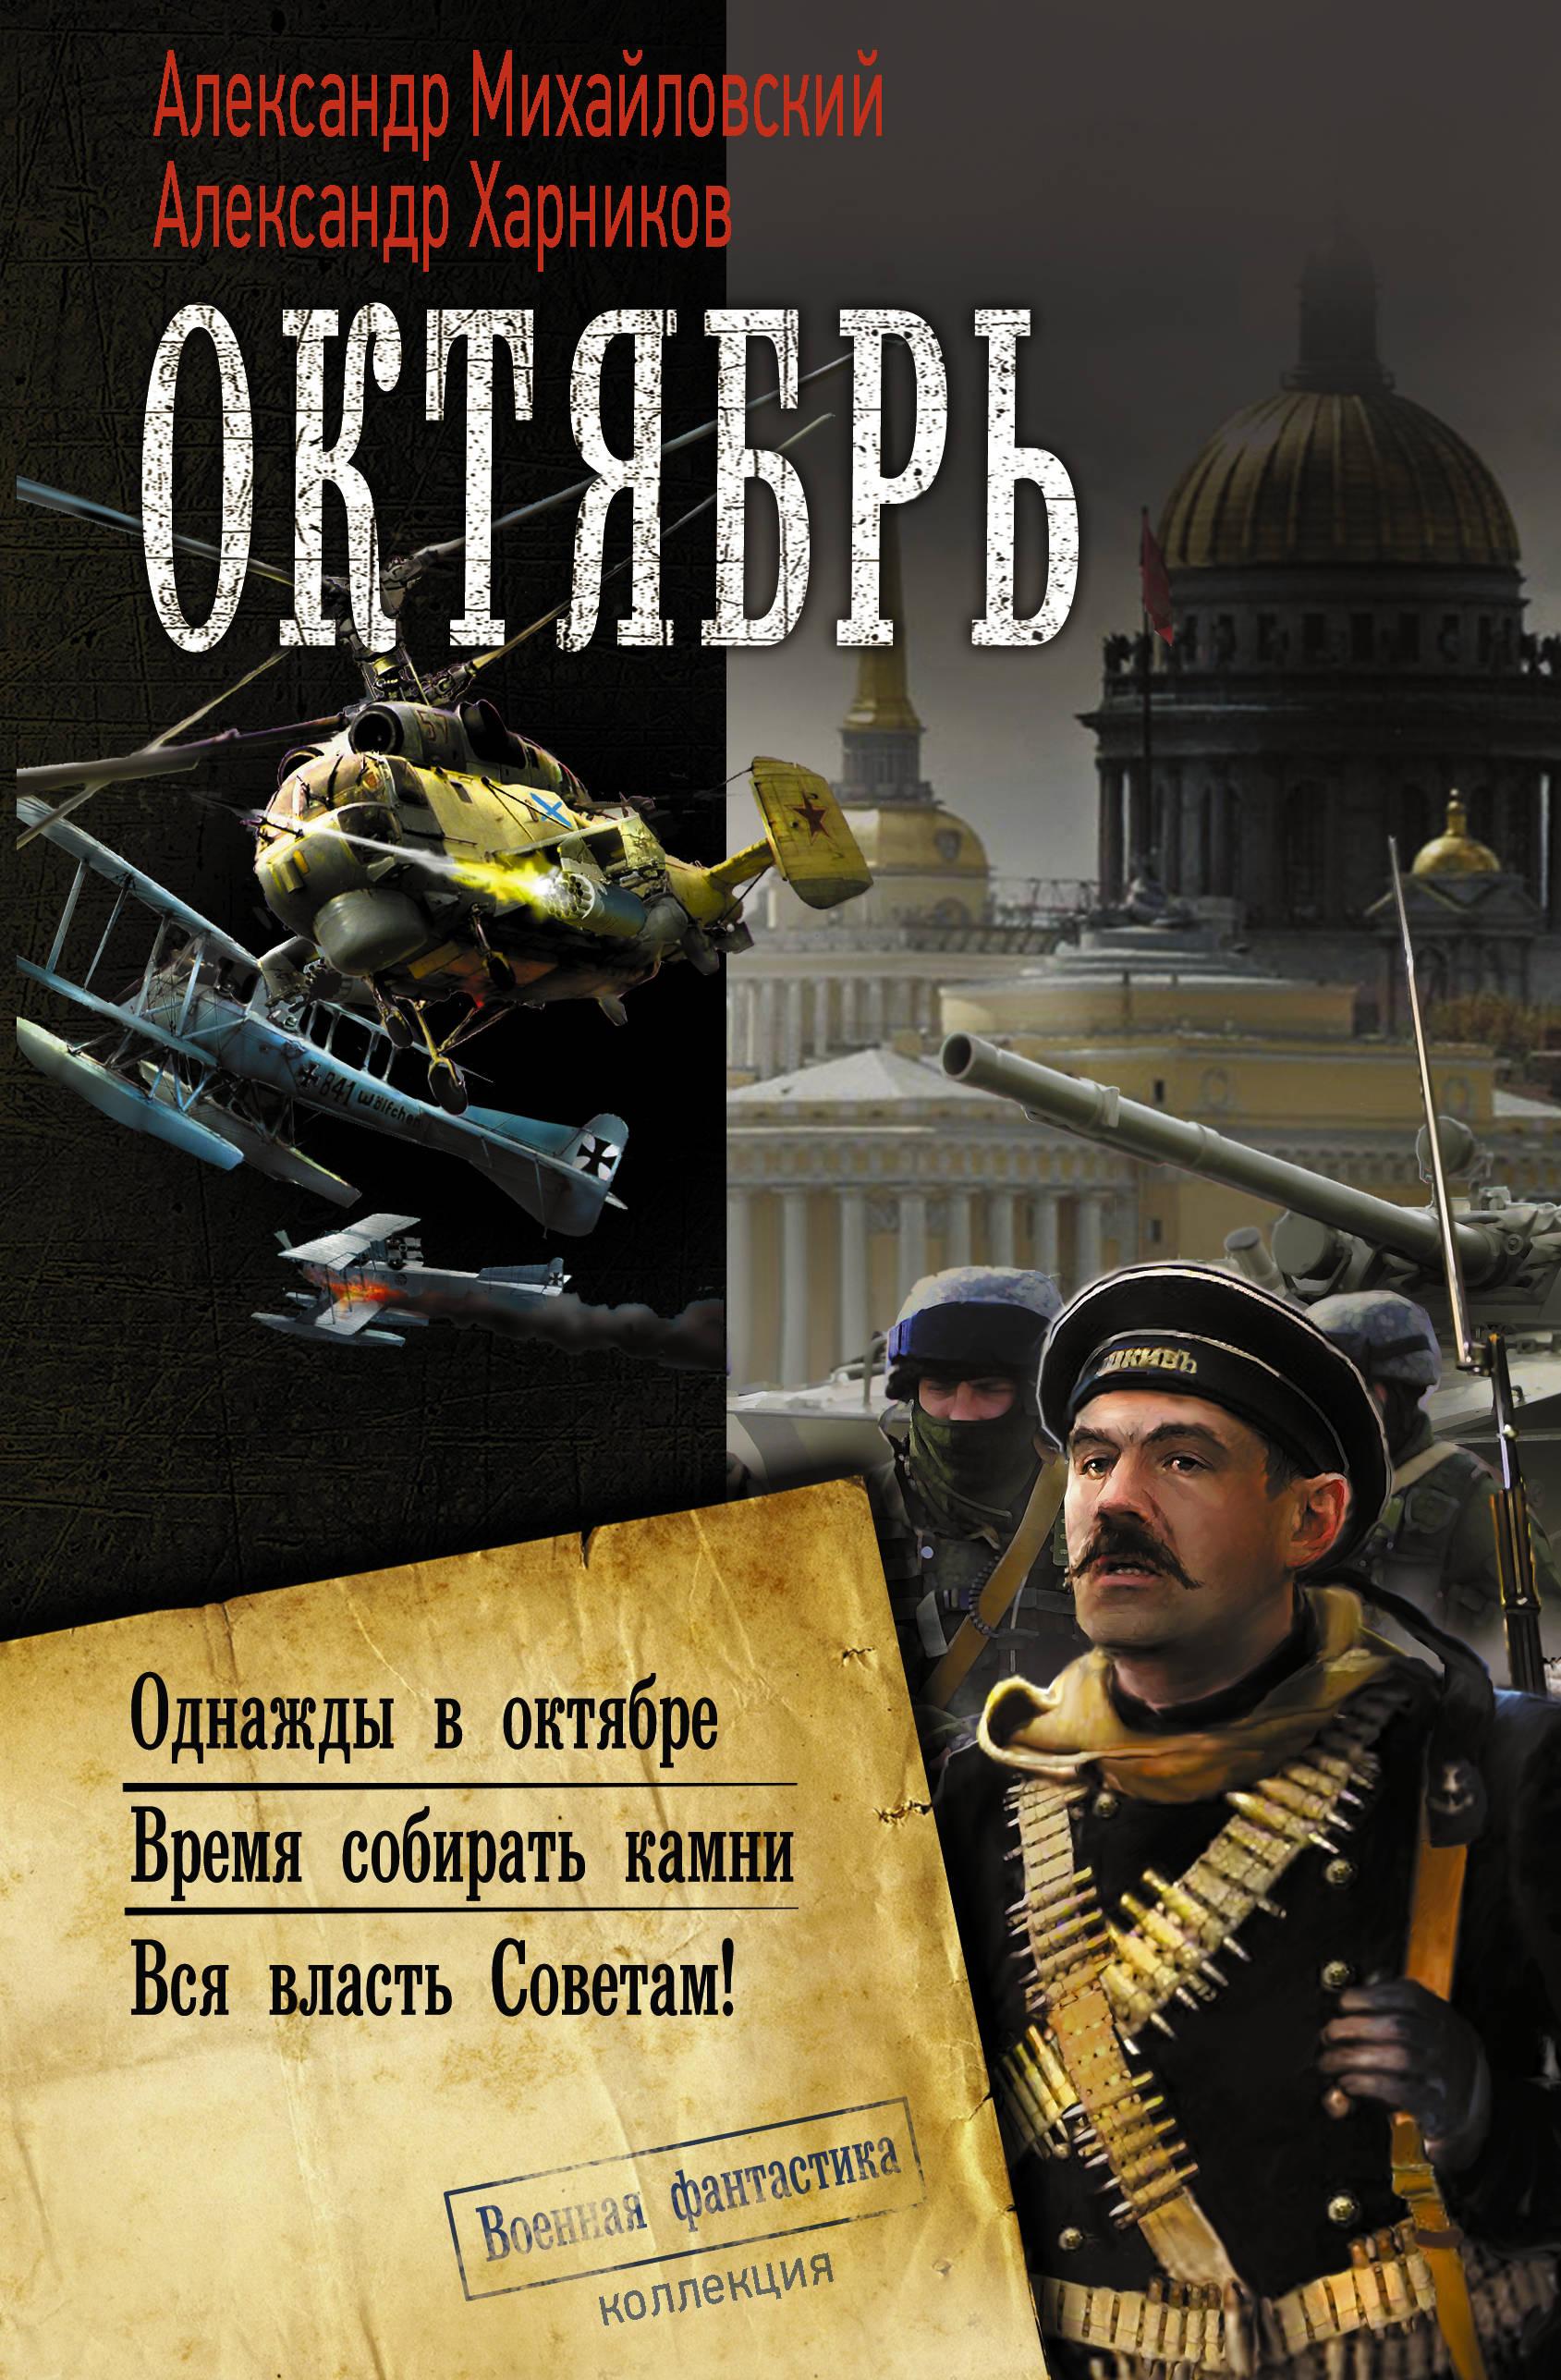 Александр Михайловский, Александр Харников Октябрь